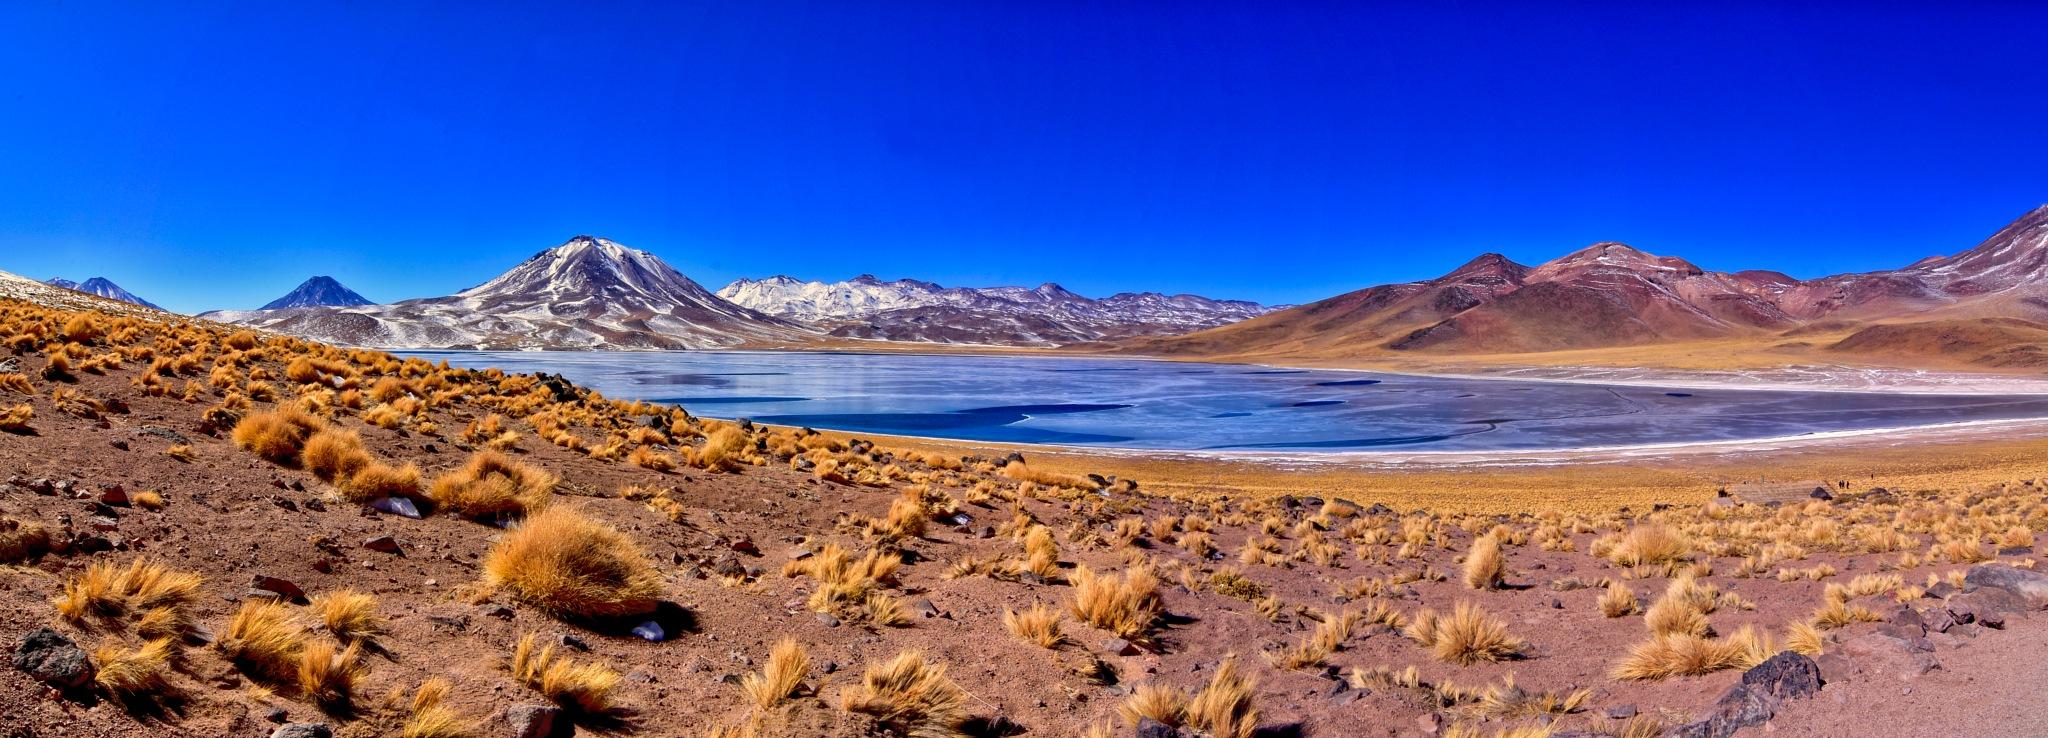 Miscanti lake by julioreyesb